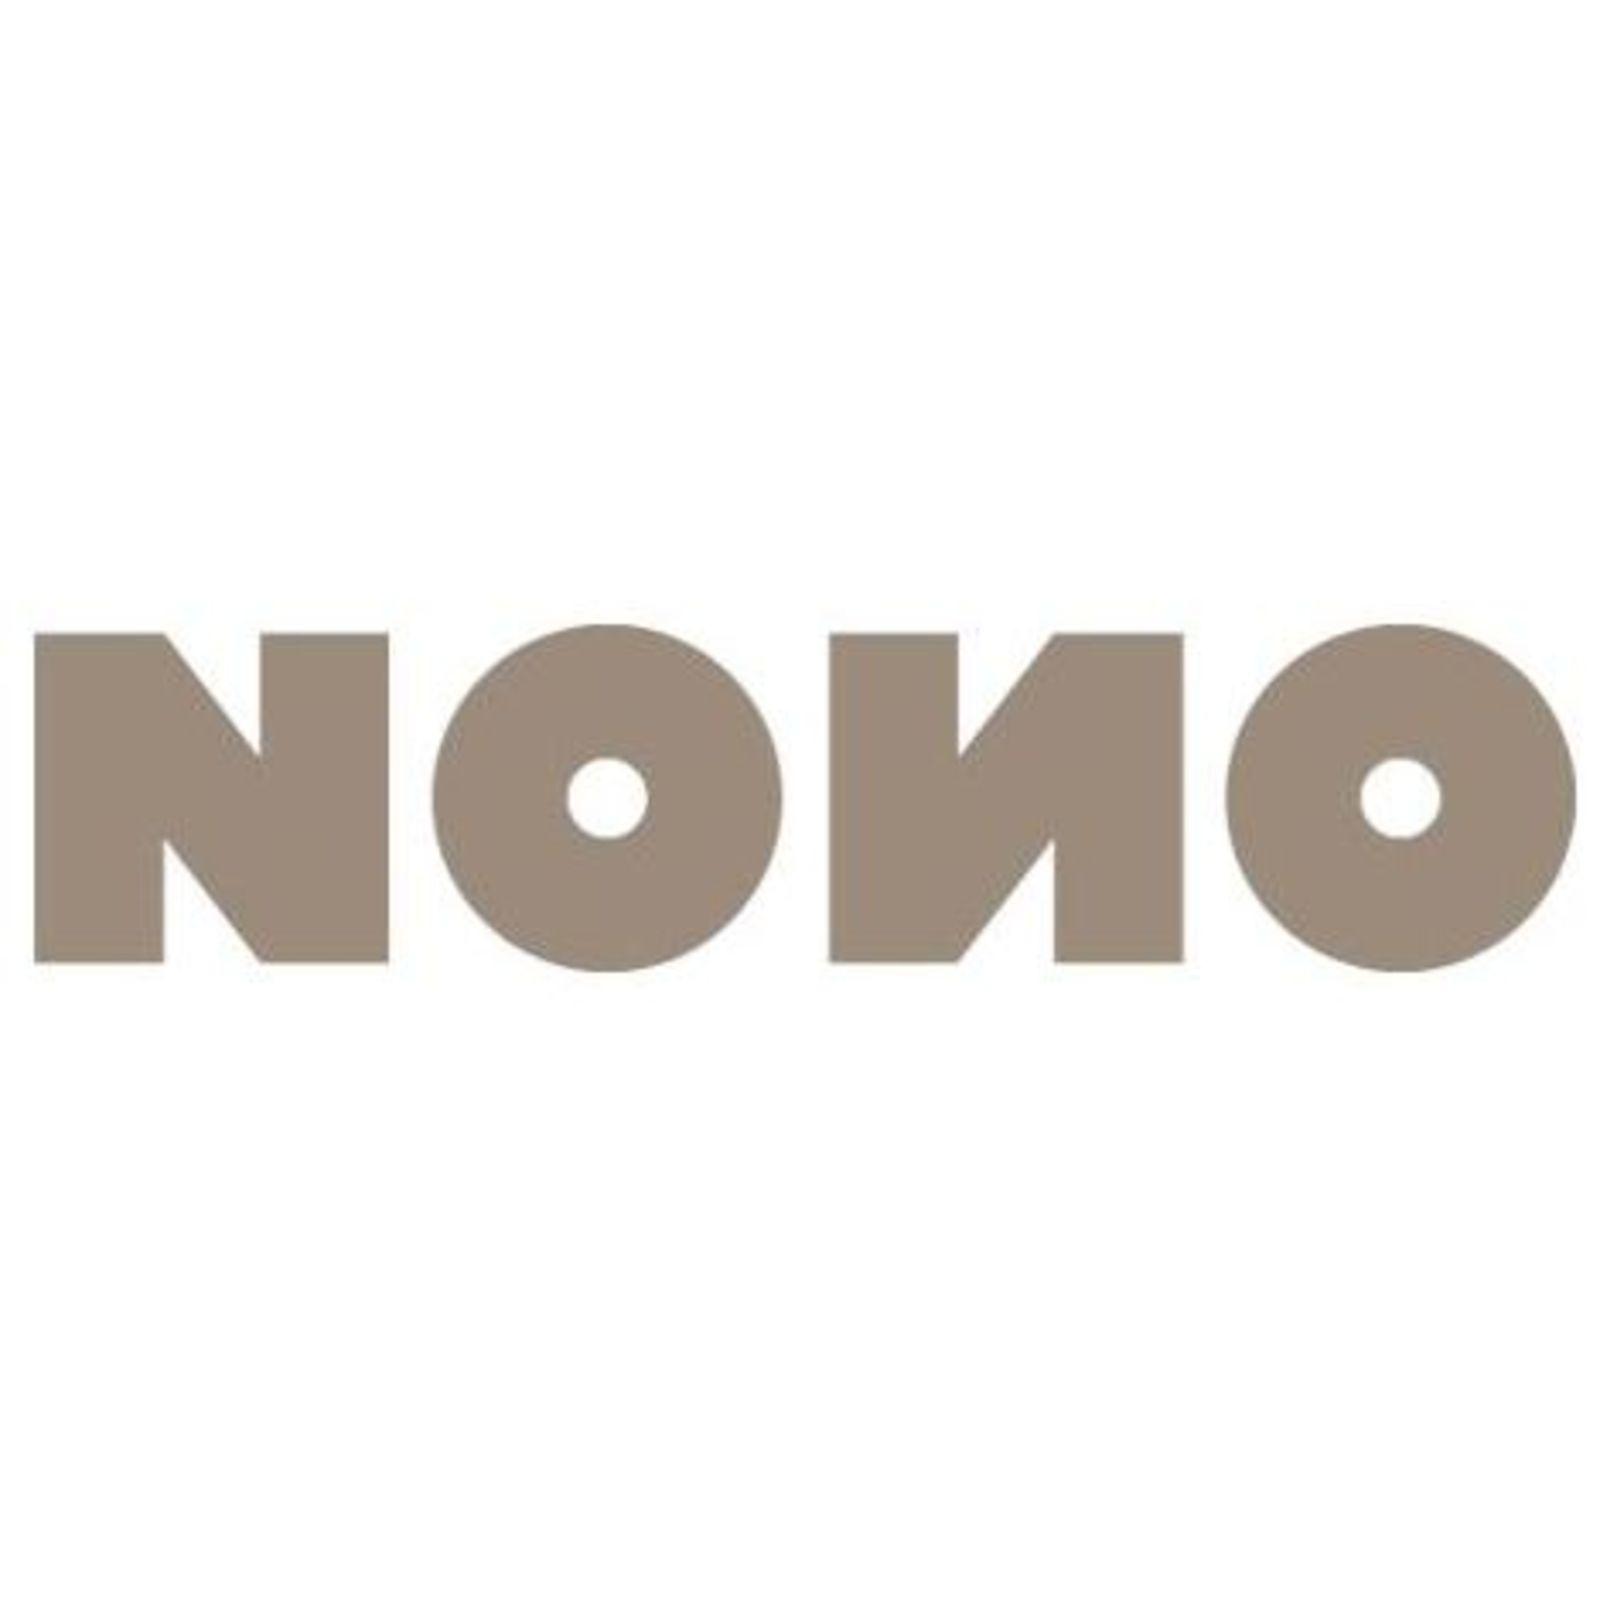 NONO (Bild 1)